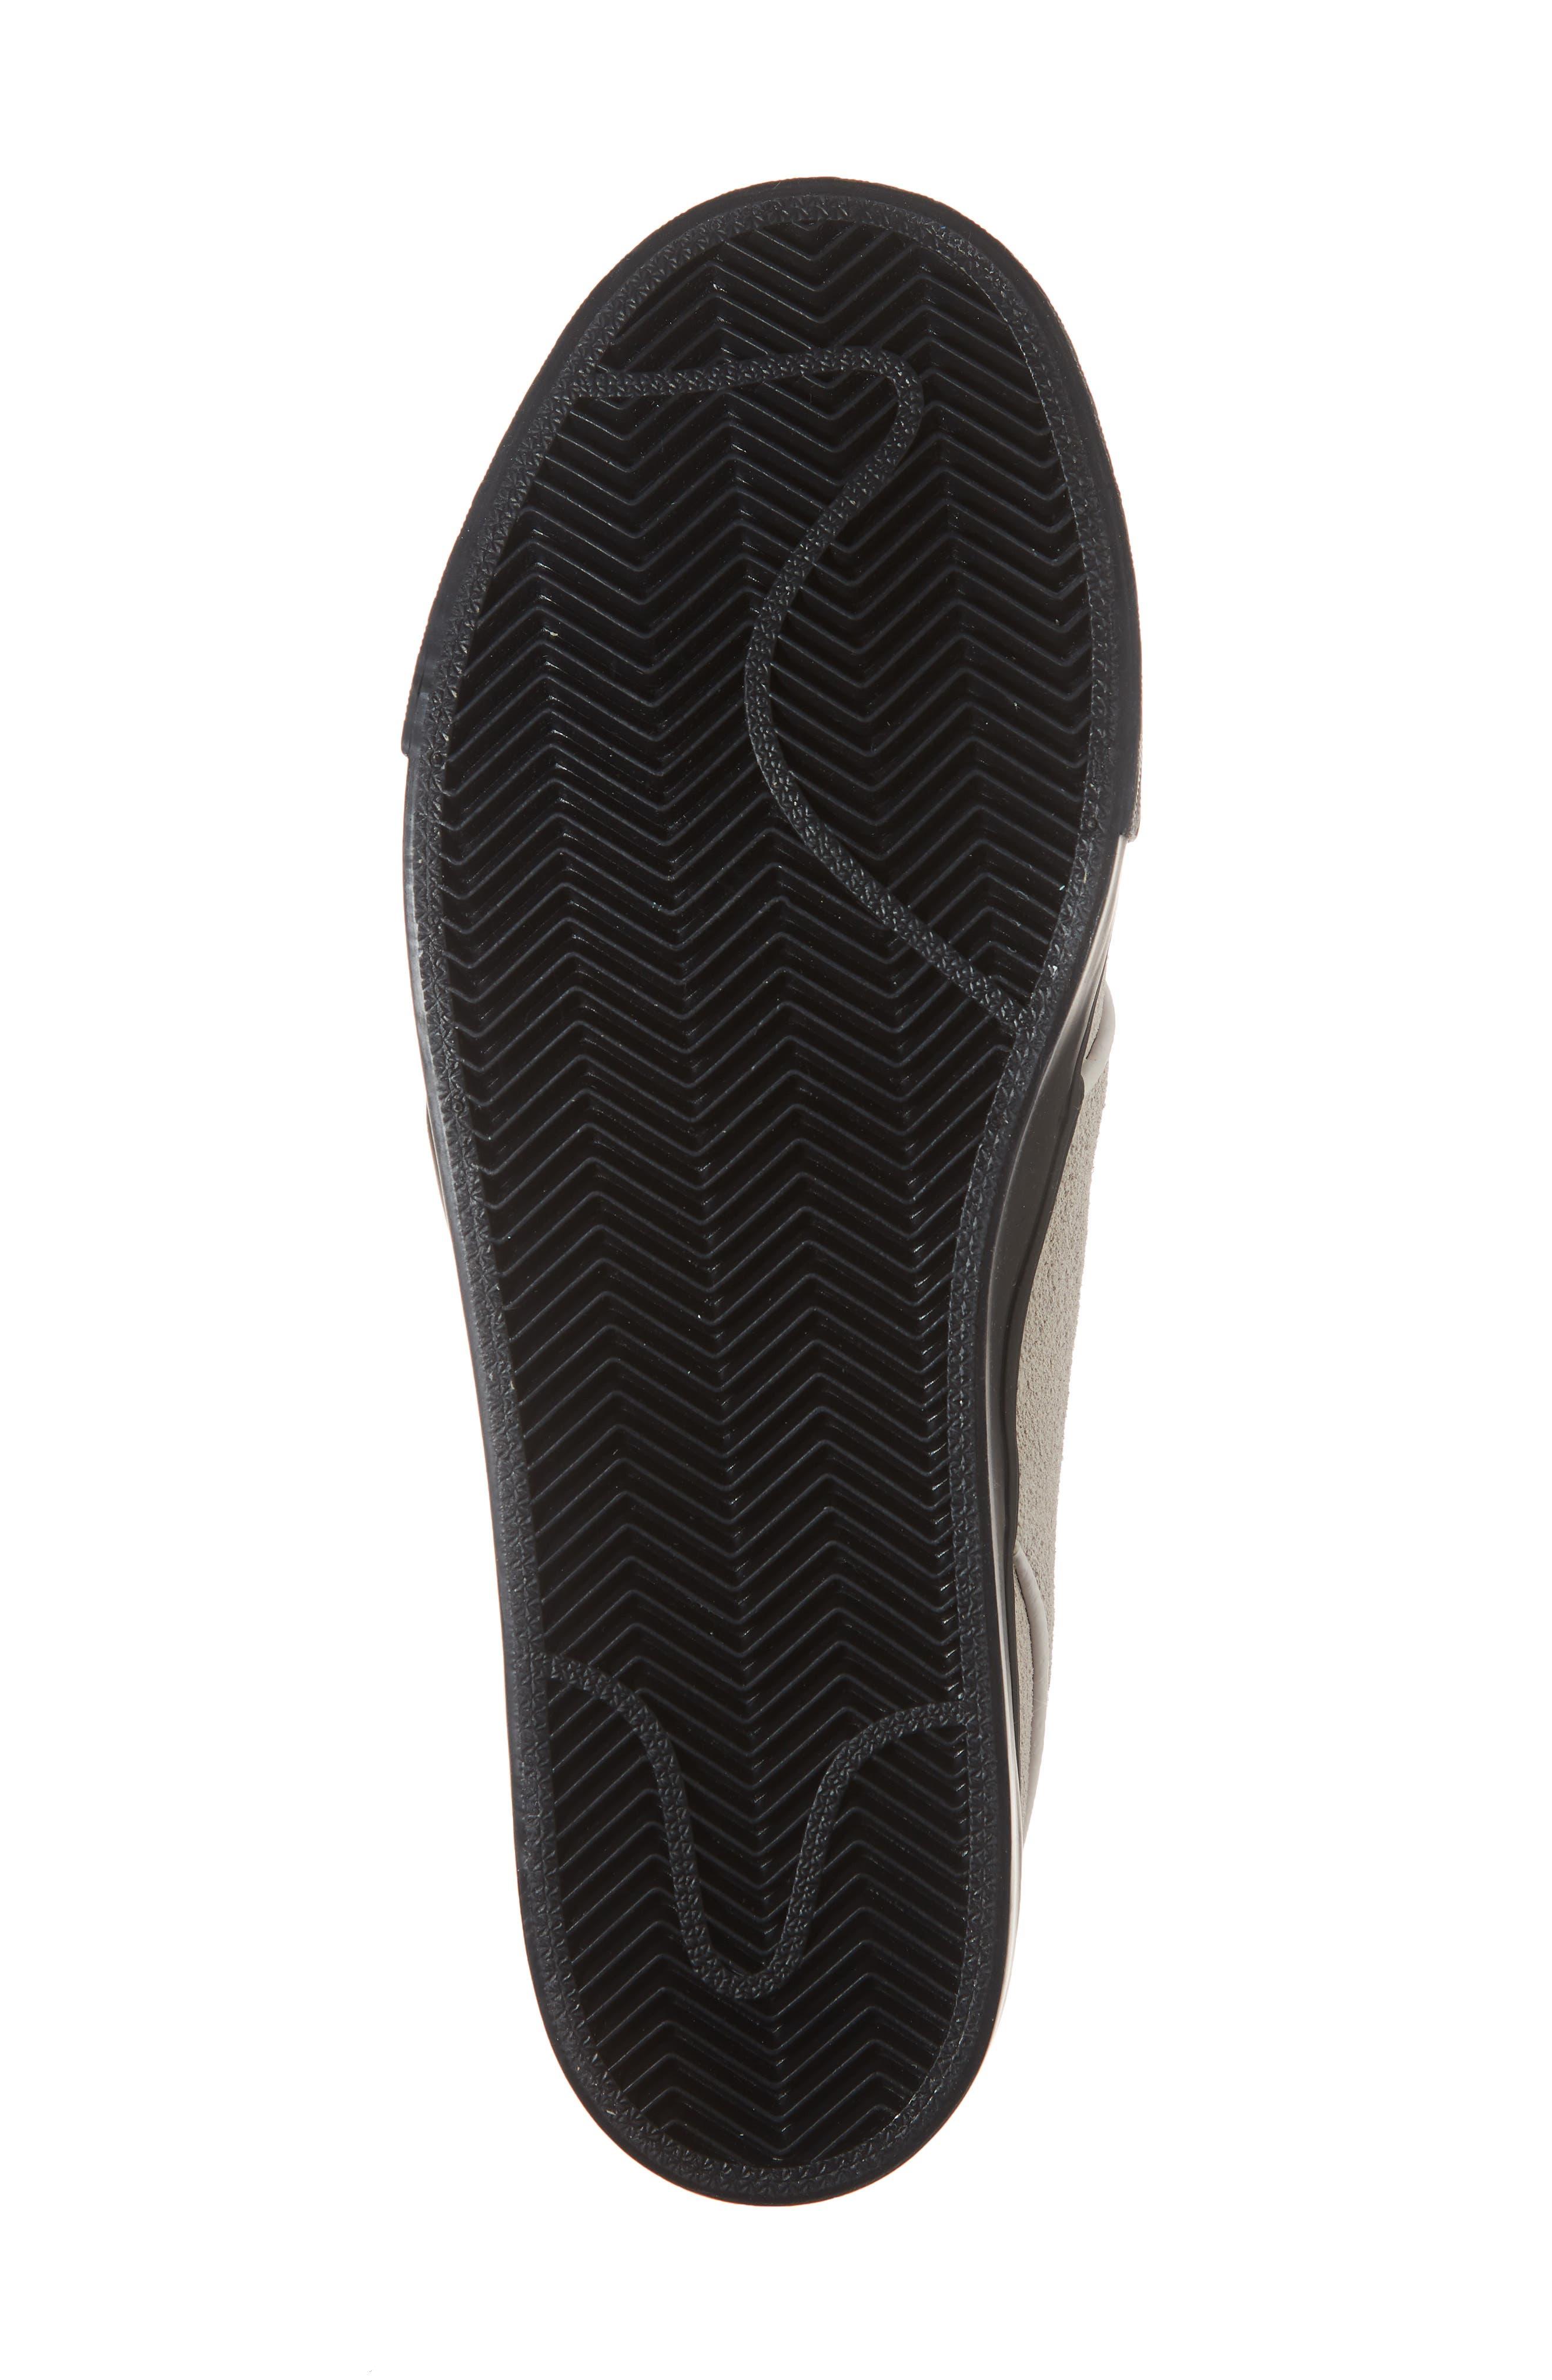 'Zoom - Stefan Janoski' Skate Shoe,                             Alternate thumbnail 6, color,                             068